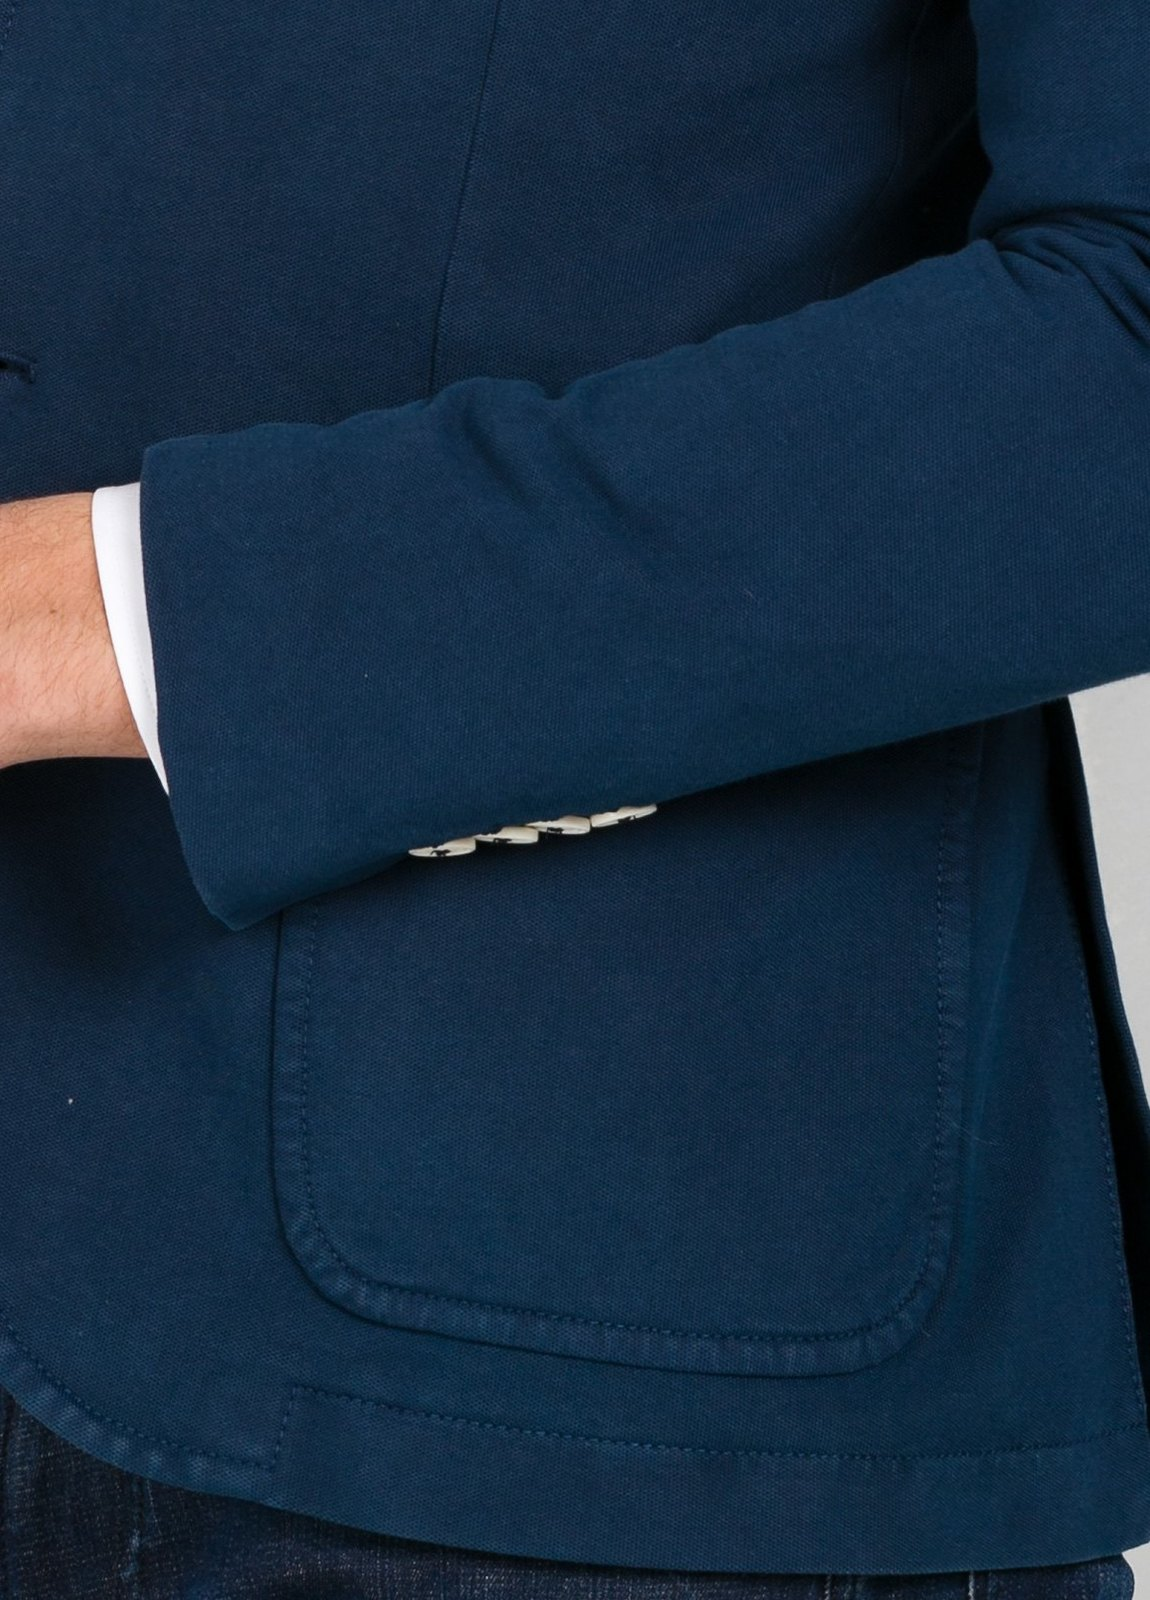 Americana soft 2 botones SLIM FIT color azul oscuro efecto denim, 95% Algodón 5% Elastán. - Ítem1